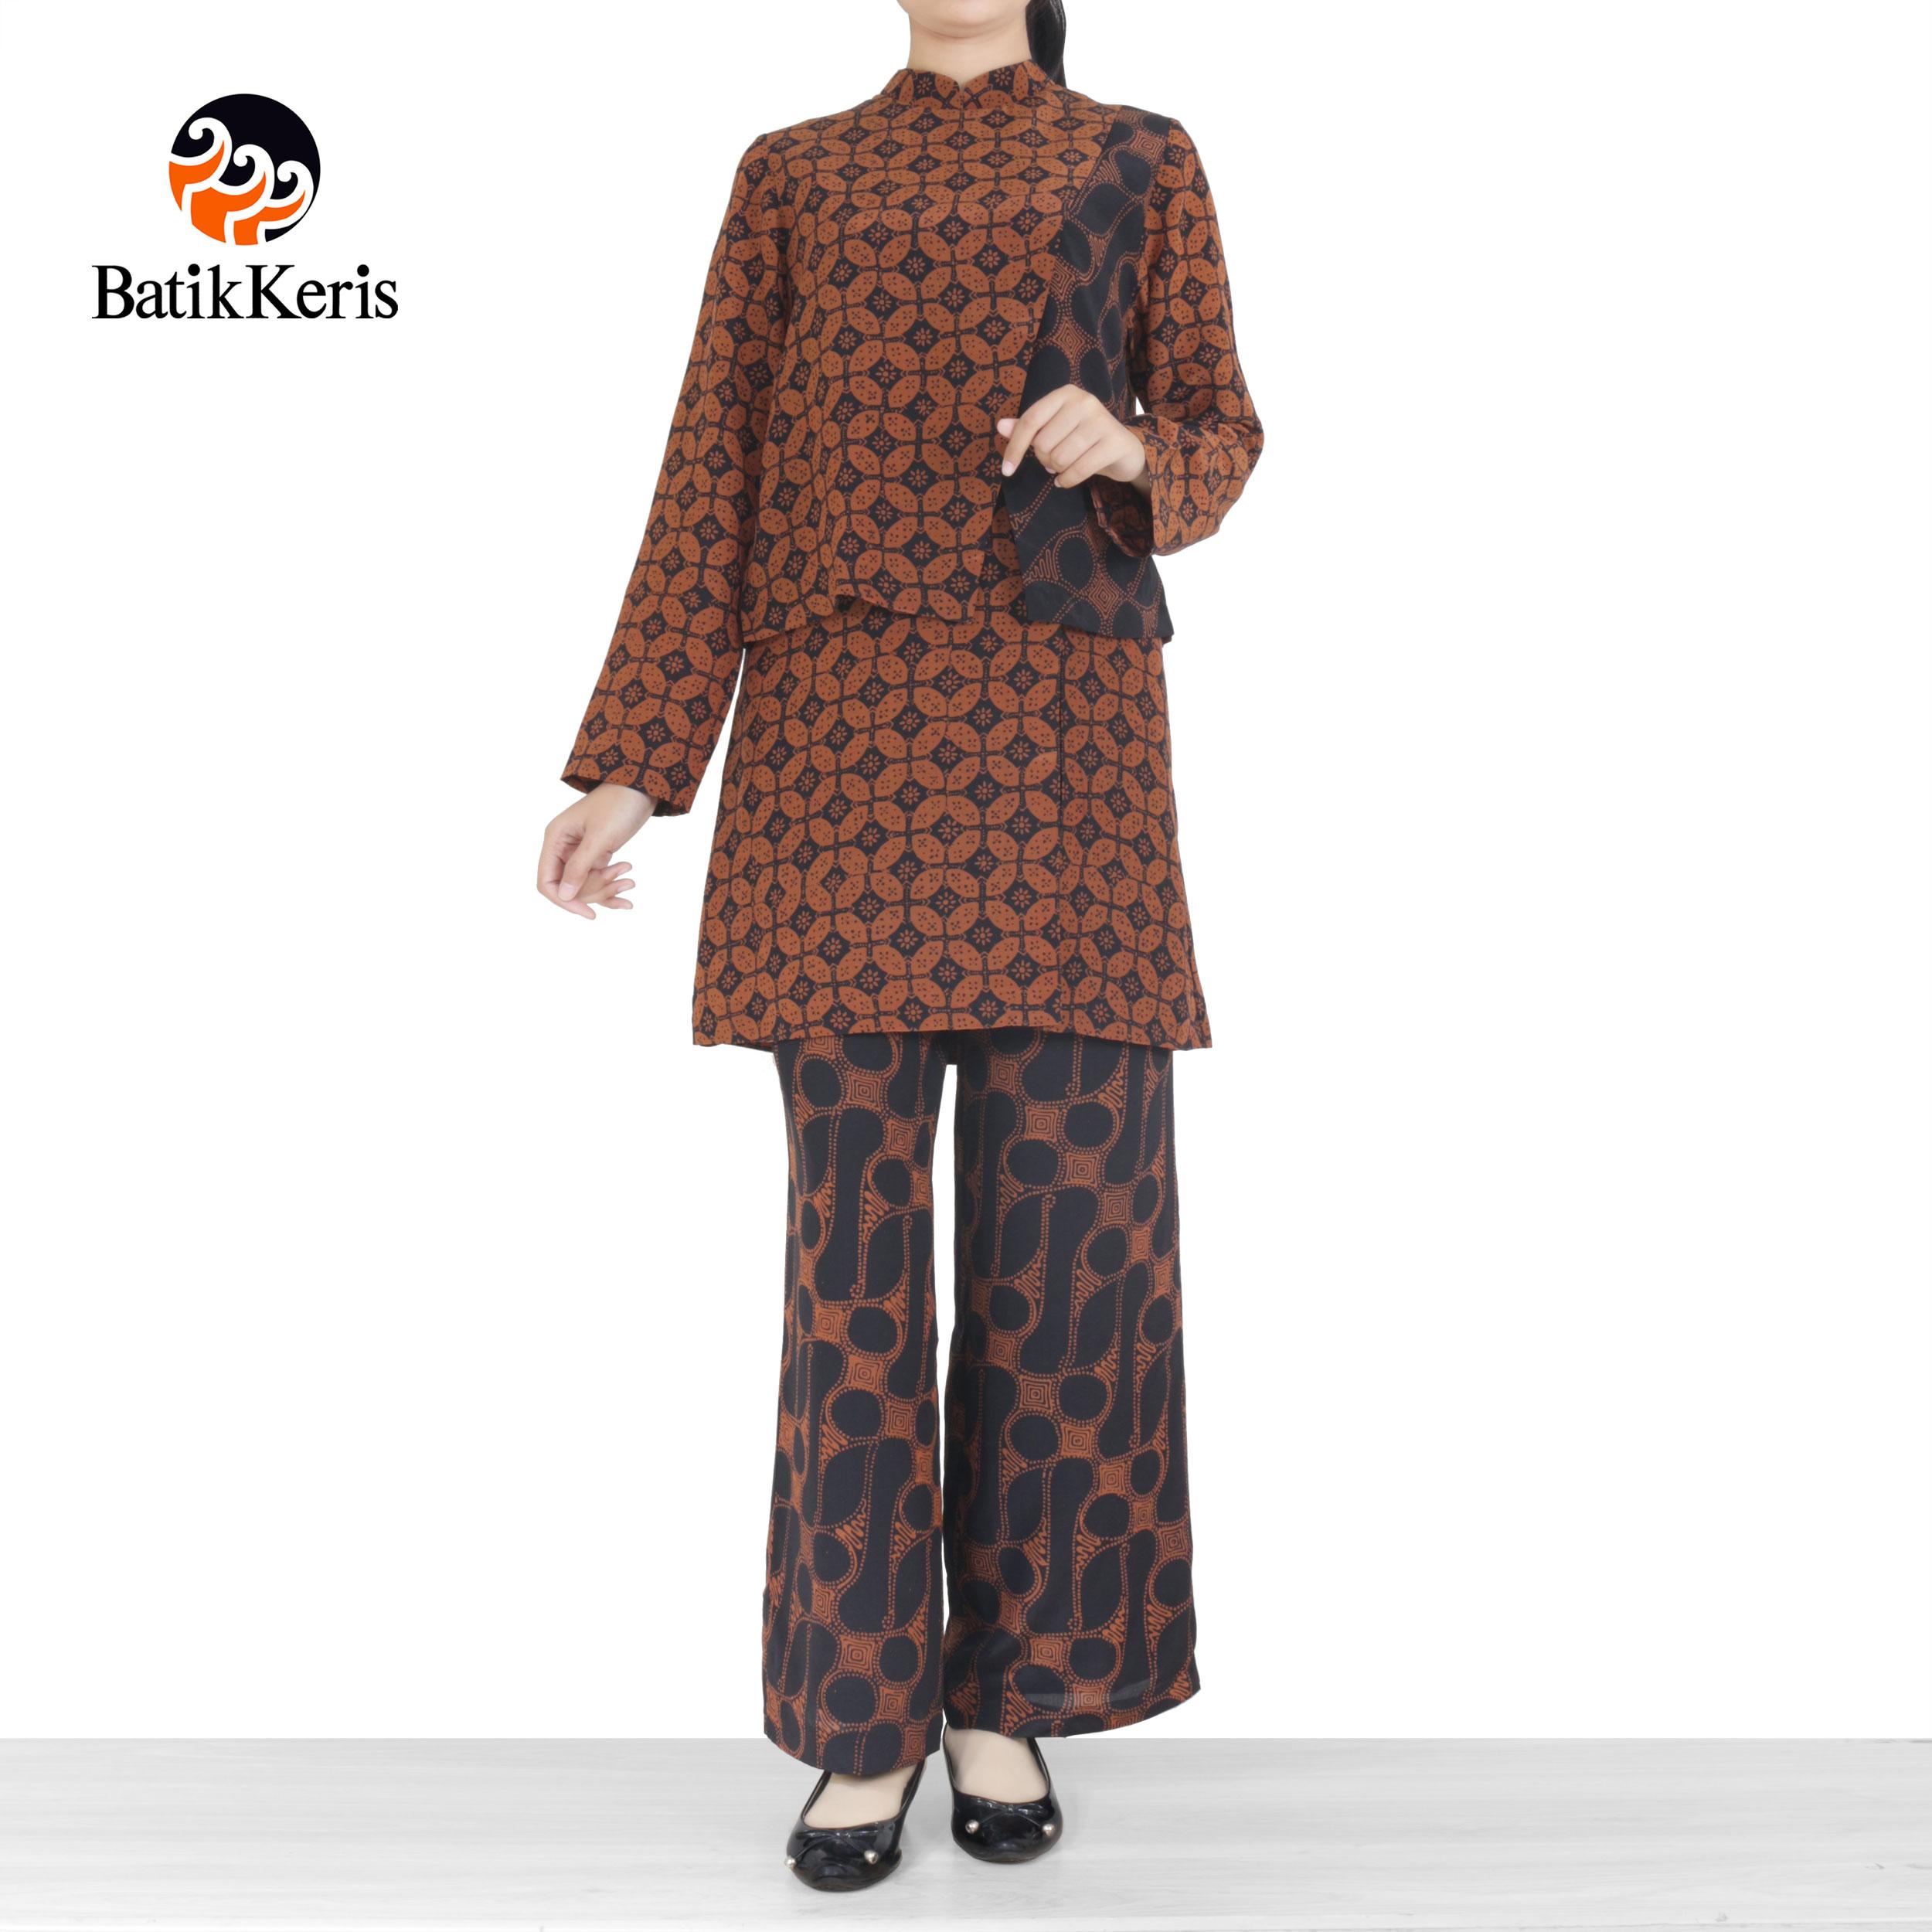 Batik Keris Online » BLOUSE CELANA BATIK MOTIF PARANG KOMBINASI KAWUNG 191f01274a